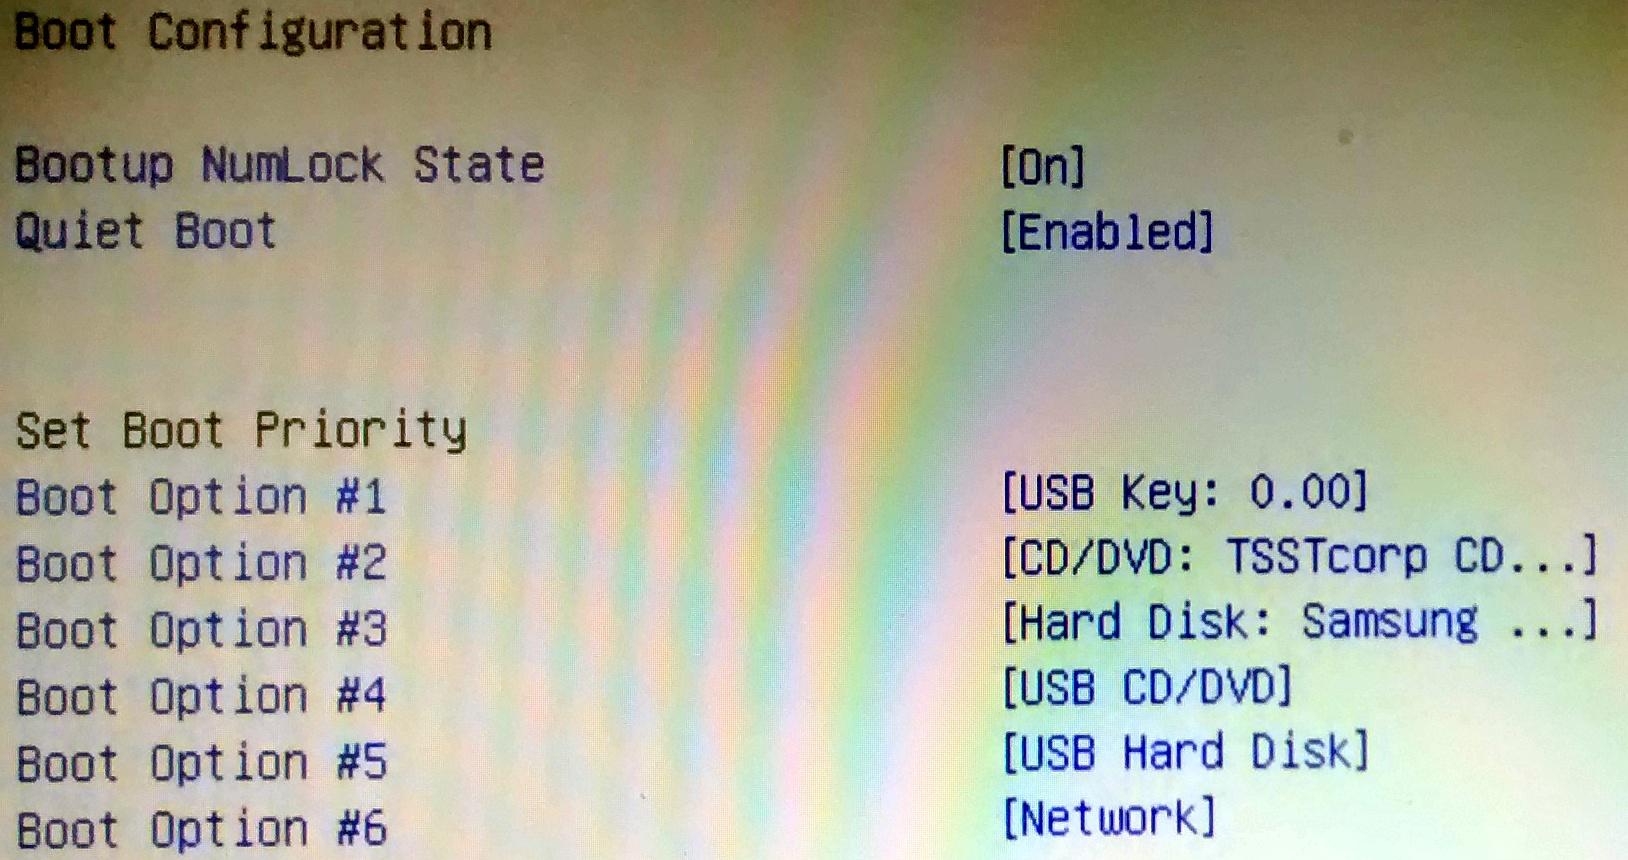 02_Boot-Configuration_IMG_20150604_175816535.jpg